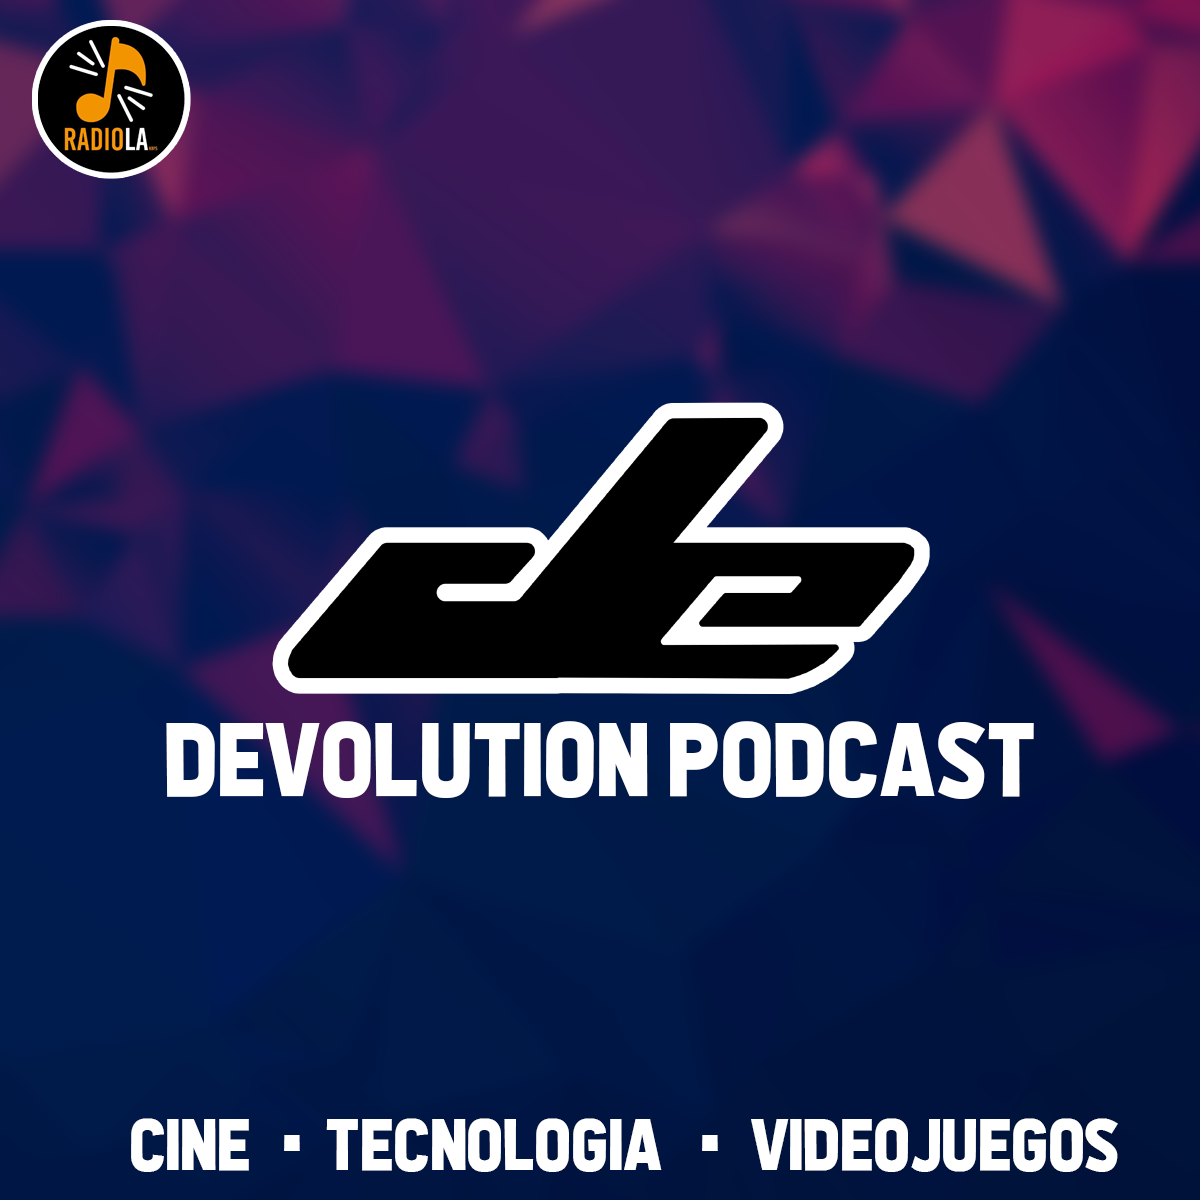 Devolution Podcast